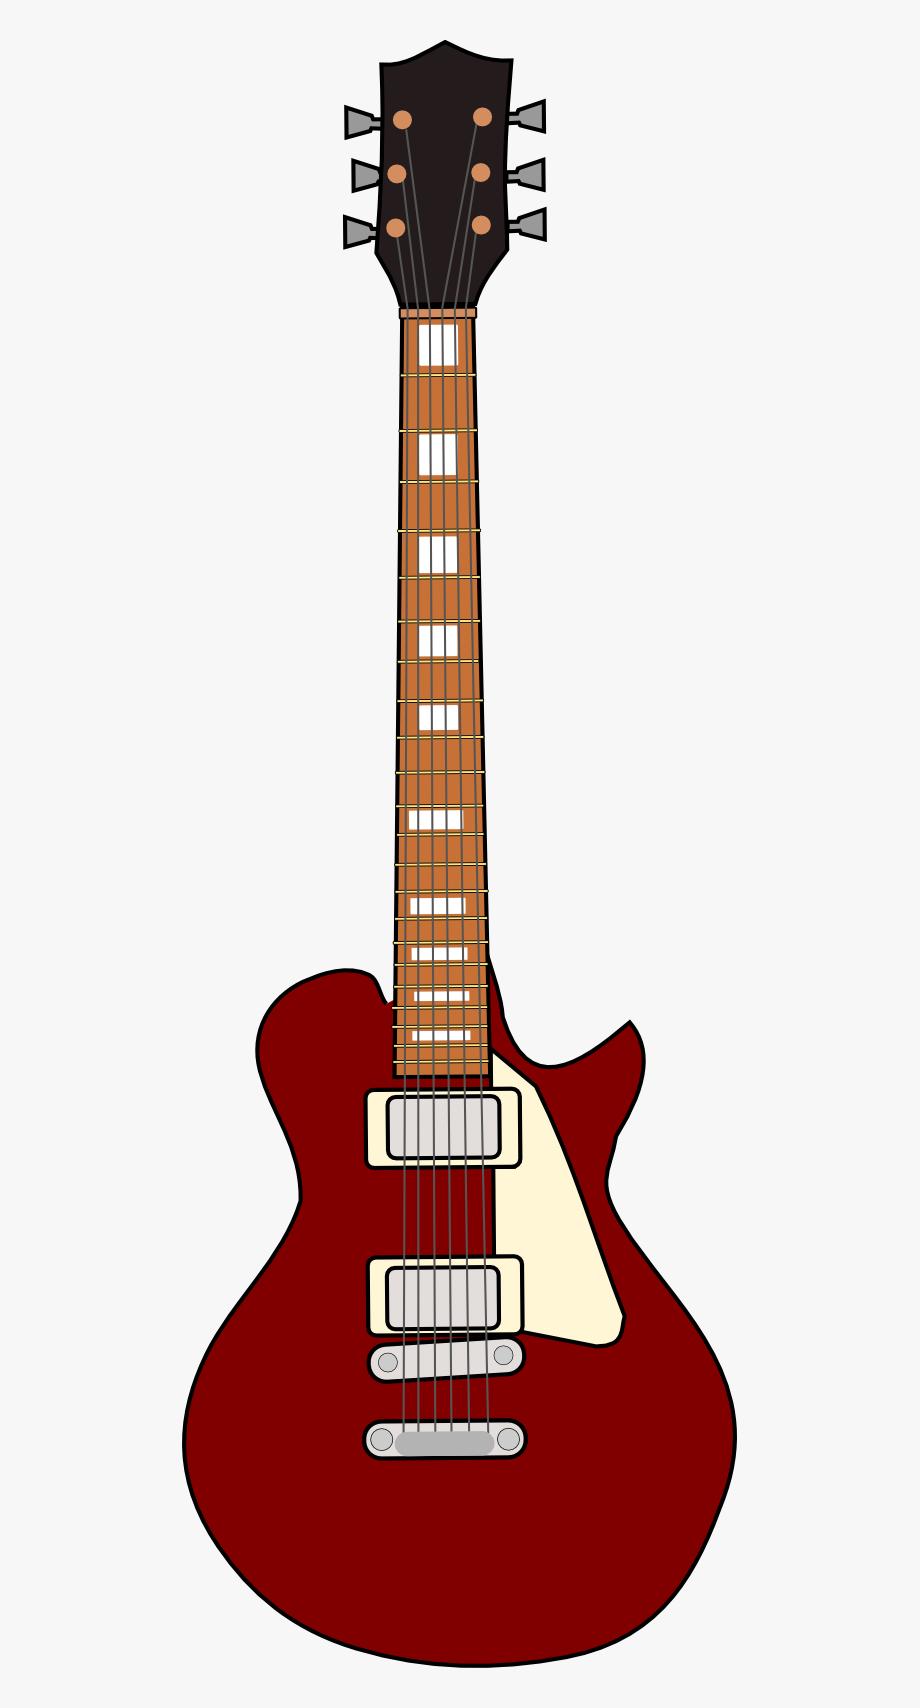 Guitar Clip Art Black White Free Clipart Images.